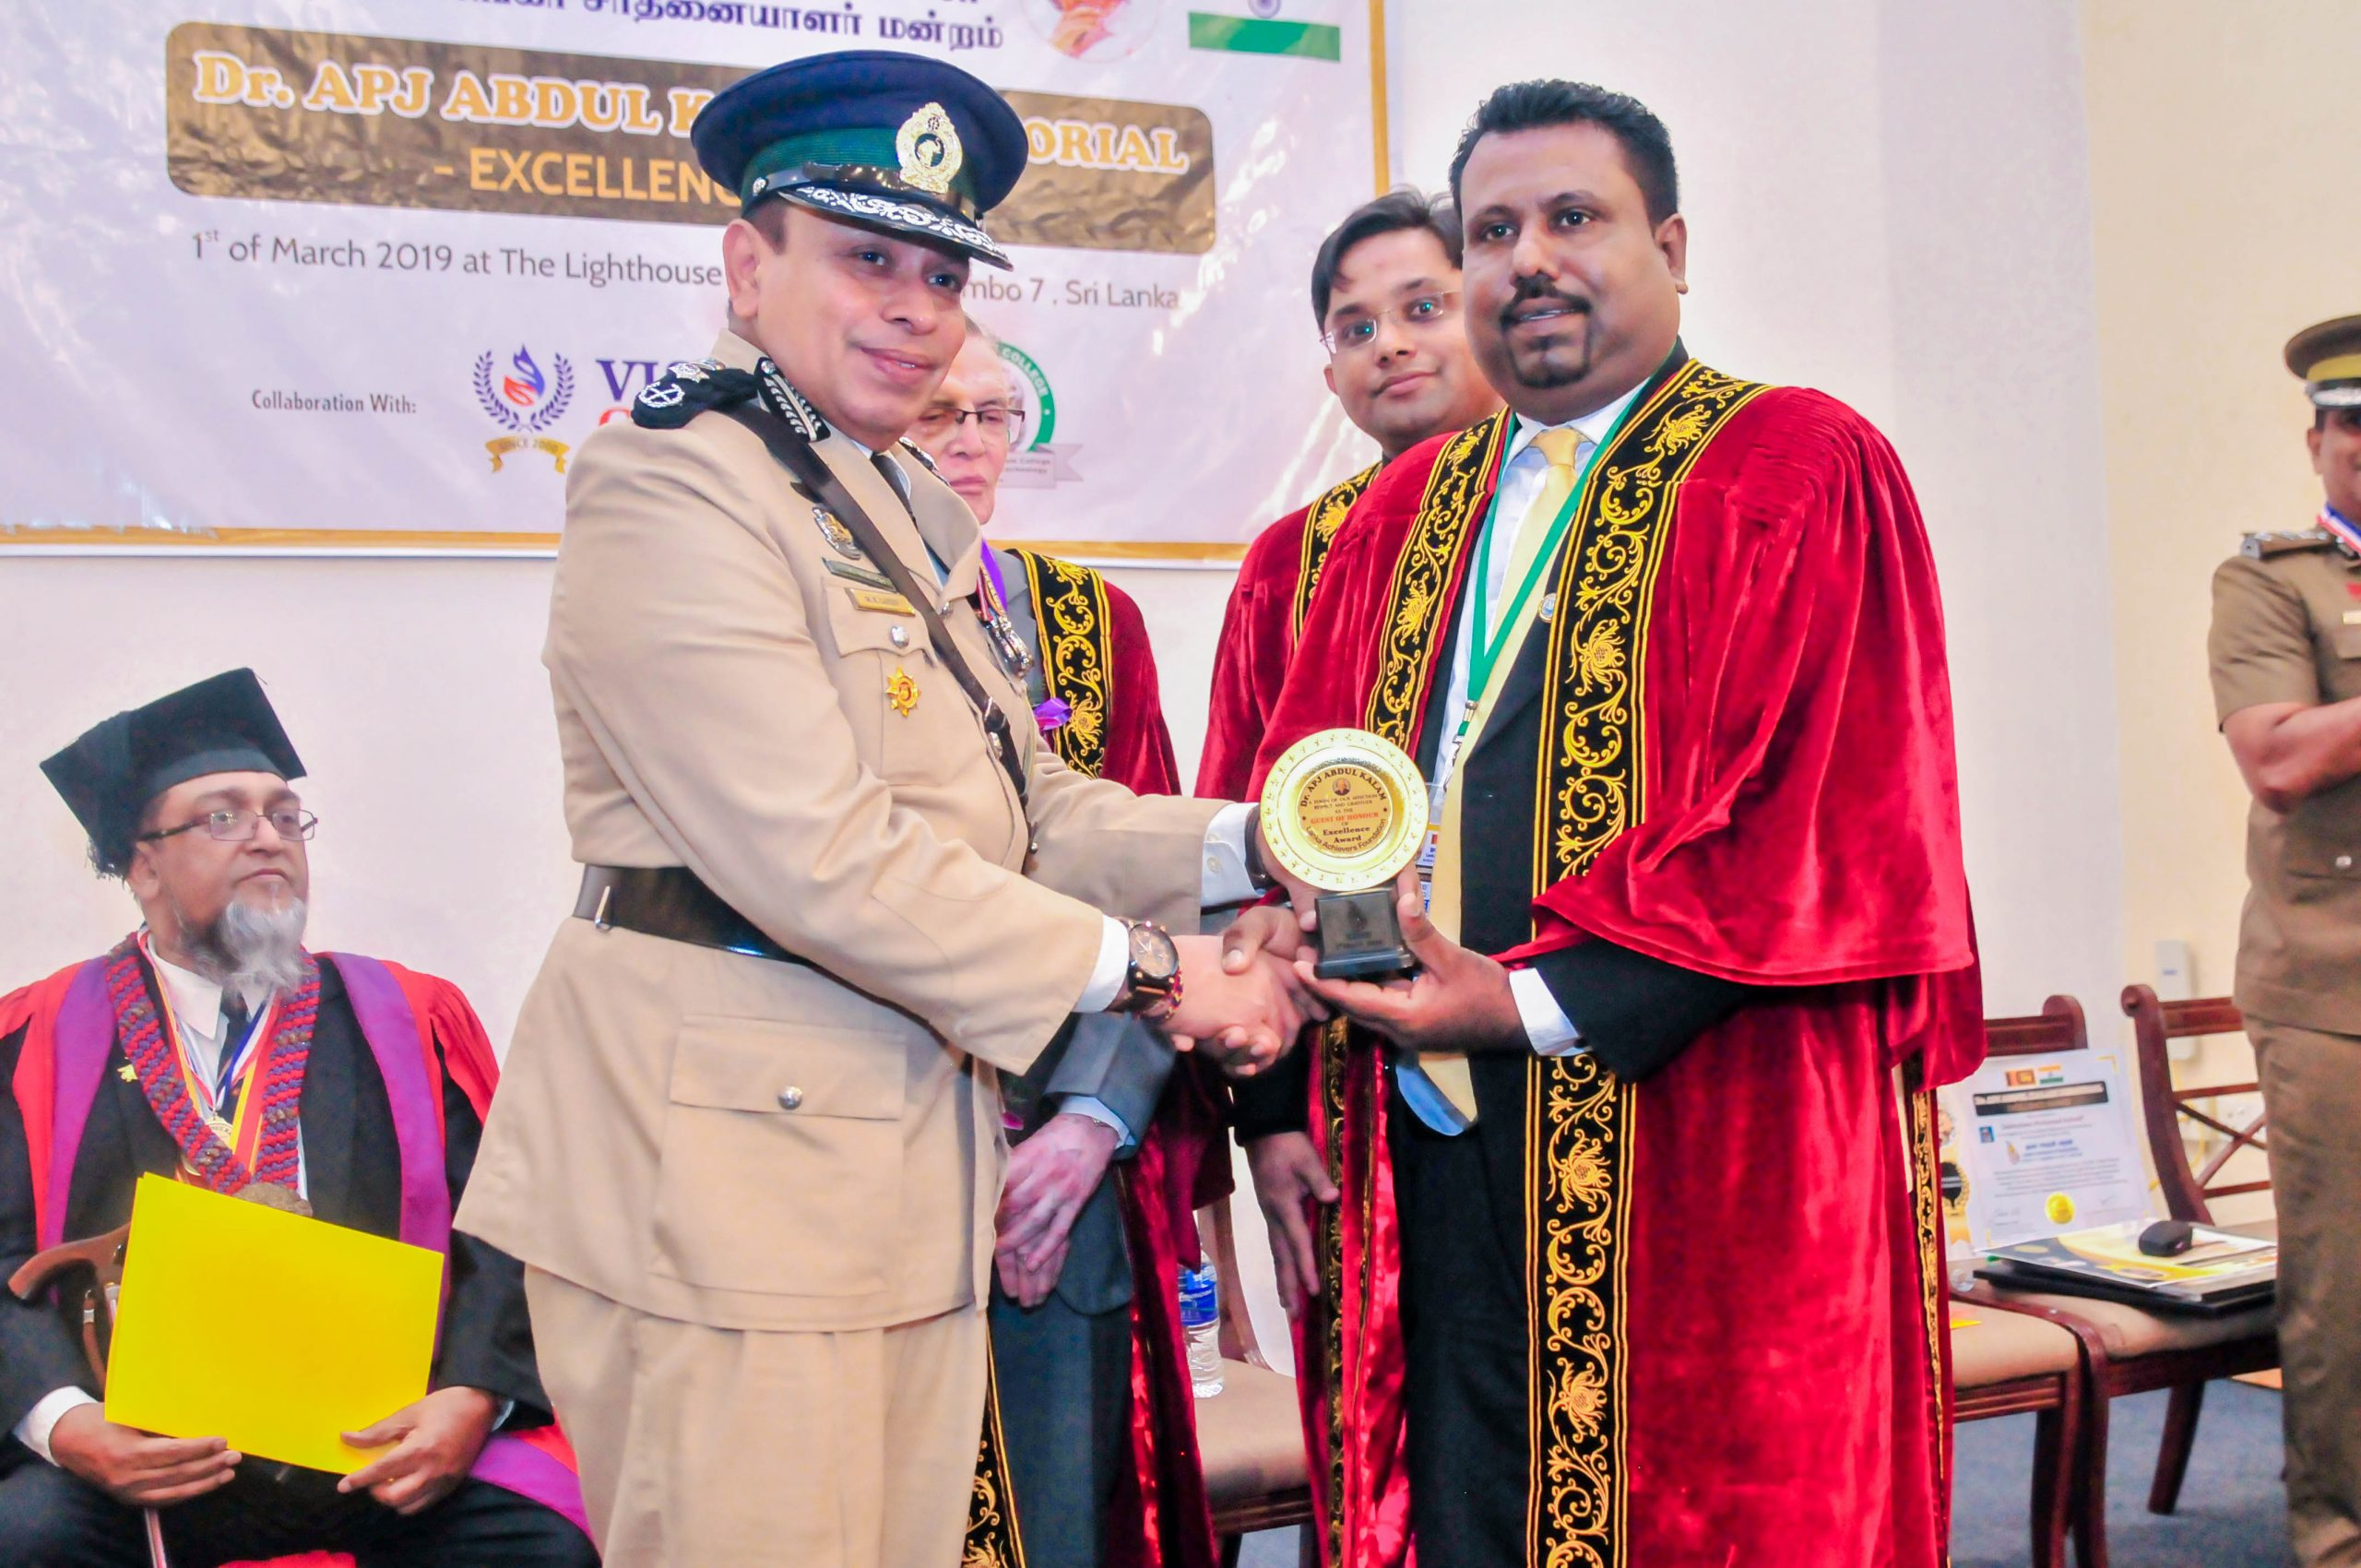 Dr. Abdul Kalam 2019 (30)